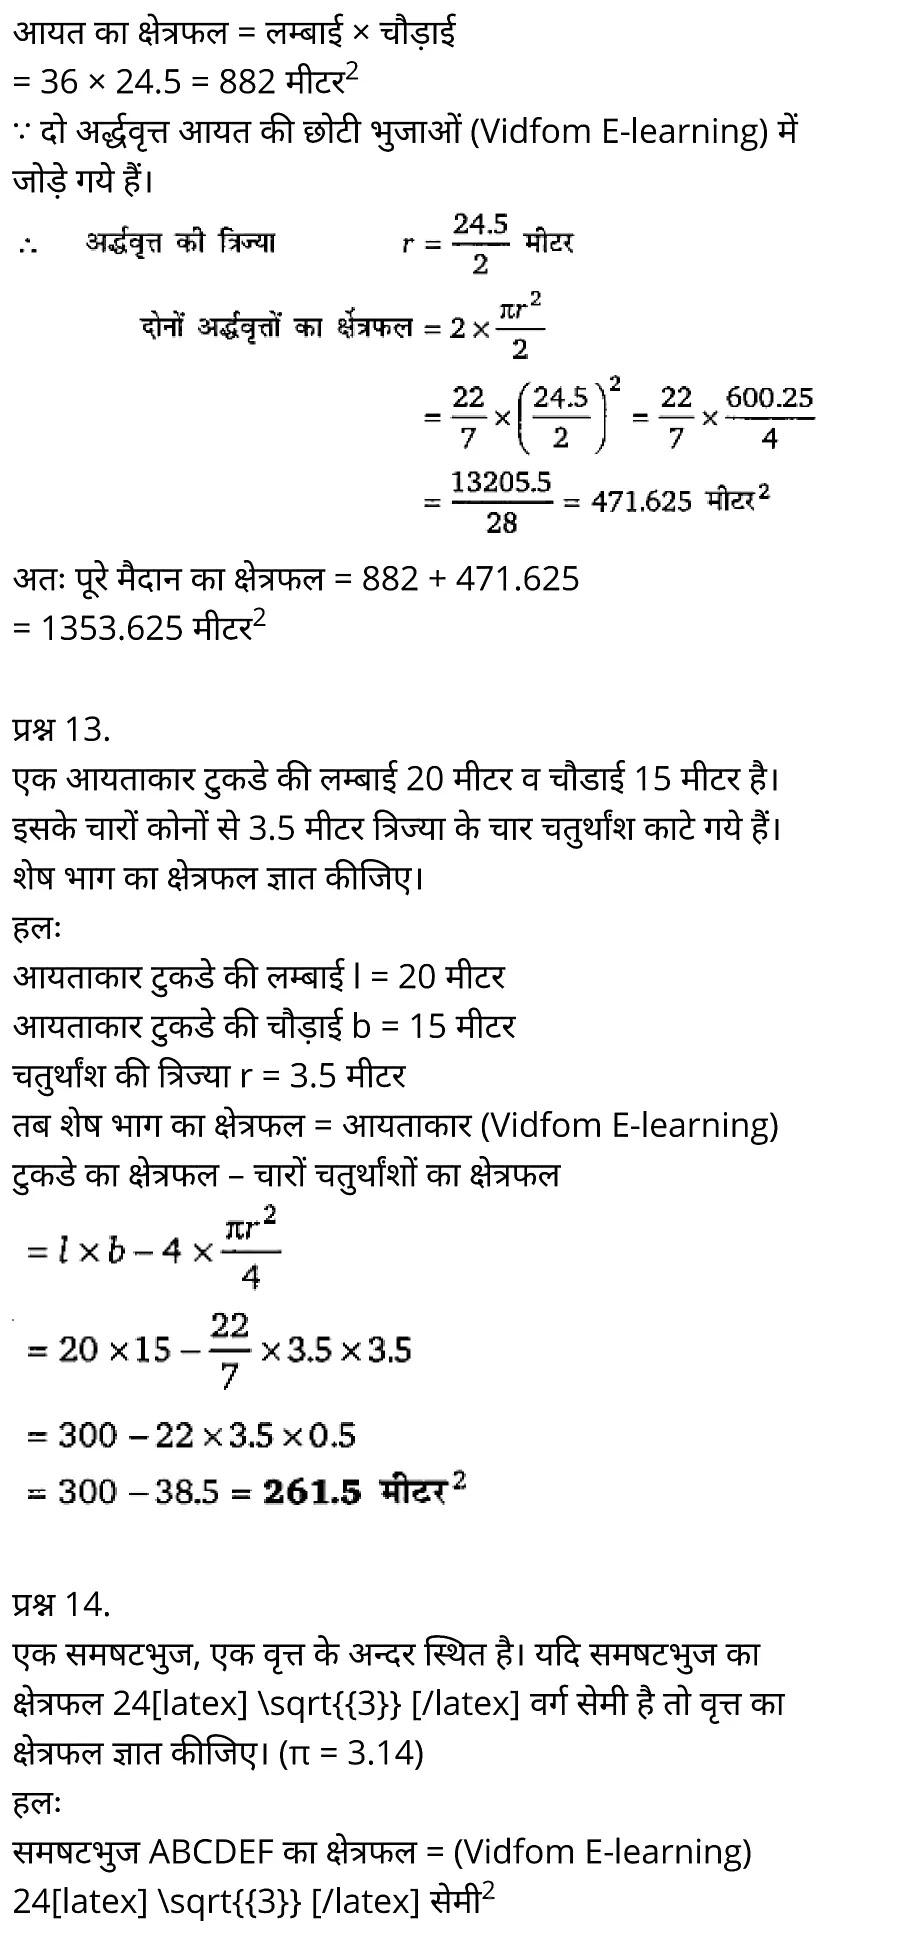 Chapter 12 Area Related to Circles Ex 12.1, Chapter 12 Area Related to Circles Ex 12.2, Chapter 12 Area Related to Circles Ex 12.3, Chapter 12 Area Related to Circles Ex 12.4, कक्षा 10 बालाजी गणित  के नोट्स  हिंदी में एनसीईआरटी समाधान,     class 10 Balaji Maths Chapter 12,   class 10 Balaji Maths Chapter 12 ncert solutions in Hindi,   class 10 Balaji Maths Chapter 12 notes in hindi,   class 10 Balaji Maths Chapter 12 question answer,   class 10 Balaji Maths Chapter 12 notes,   class 10 Balaji Maths Chapter 12 class 10 Balaji Maths Chapter 12 in  hindi,    class 10 Balaji Maths Chapter 12 important questions in  hindi,   class 10 Balaji Maths Chapter 12 notes in hindi,    class 10 Balaji Maths Chapter 12 test,   class 10 Balaji Maths Chapter 12 pdf,   class 10 Balaji Maths Chapter 12 notes pdf,   class 10 Balaji Maths Chapter 12 exercise solutions,   class 10 Balaji Maths Chapter 12 notes study rankers,   class 10 Balaji Maths Chapter 12 notes,    class 10 Balaji Maths Chapter 12  class 10  notes pdf,   class 10 Balaji Maths Chapter 12 class 10  notes  ncert,   class 10 Balaji Maths Chapter 12 class 10 pdf,   class 10 Balaji Maths Chapter 12  book,   class 10 Balaji Maths Chapter 12 quiz class 10  ,    10  th class 10 Balaji Maths Chapter 12  book up board,   up board 10  th class 10 Balaji Maths Chapter 12 notes,  class 10 Balaji Maths,   class 10 Balaji Maths ncert solutions in Hindi,   class 10 Balaji Maths notes in hindi,   class 10 Balaji Maths question answer,   class 10 Balaji Maths notes,  class 10 Balaji Maths class 10 Balaji Maths Chapter 12 in  hindi,    class 10 Balaji Maths important questions in  hindi,   class 10 Balaji Maths notes in hindi,    class 10 Balaji Maths test,  class 10 Balaji Maths class 10 Balaji Maths Chapter 12 pdf,   class 10 Balaji Maths notes pdf,   class 10 Balaji Maths exercise solutions,   class 10 Balaji Maths,  class 10 Balaji Maths notes study rankers,   class 10 Balaji Maths notes,  class 10 Balaji Maths notes,   class 10 Bala